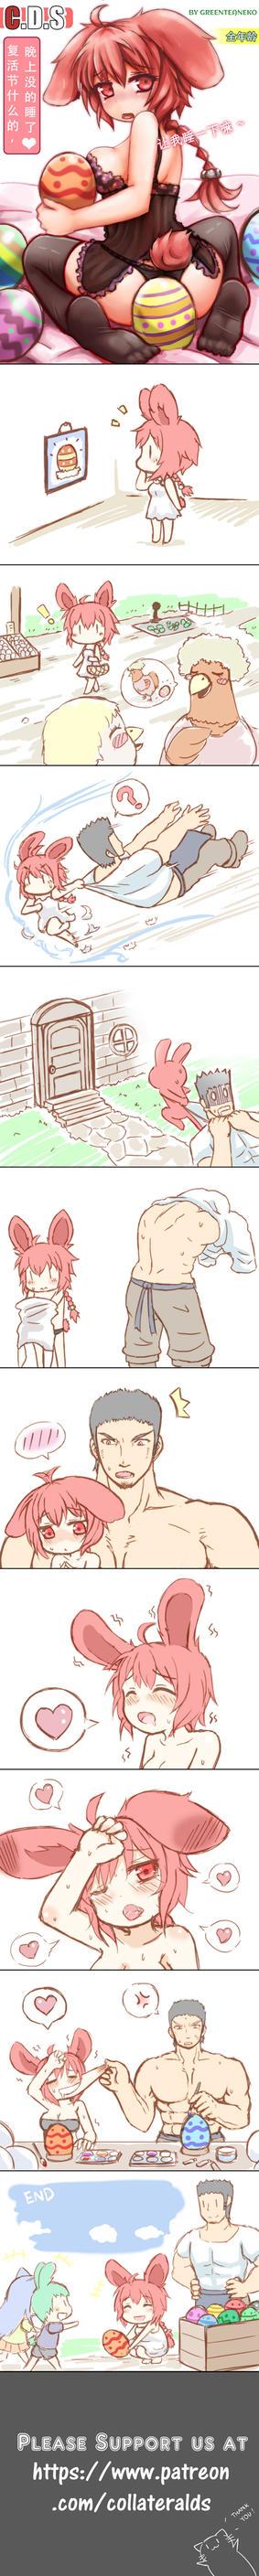 MonGirl Nora Chapter 5 by GreenTeaNeko